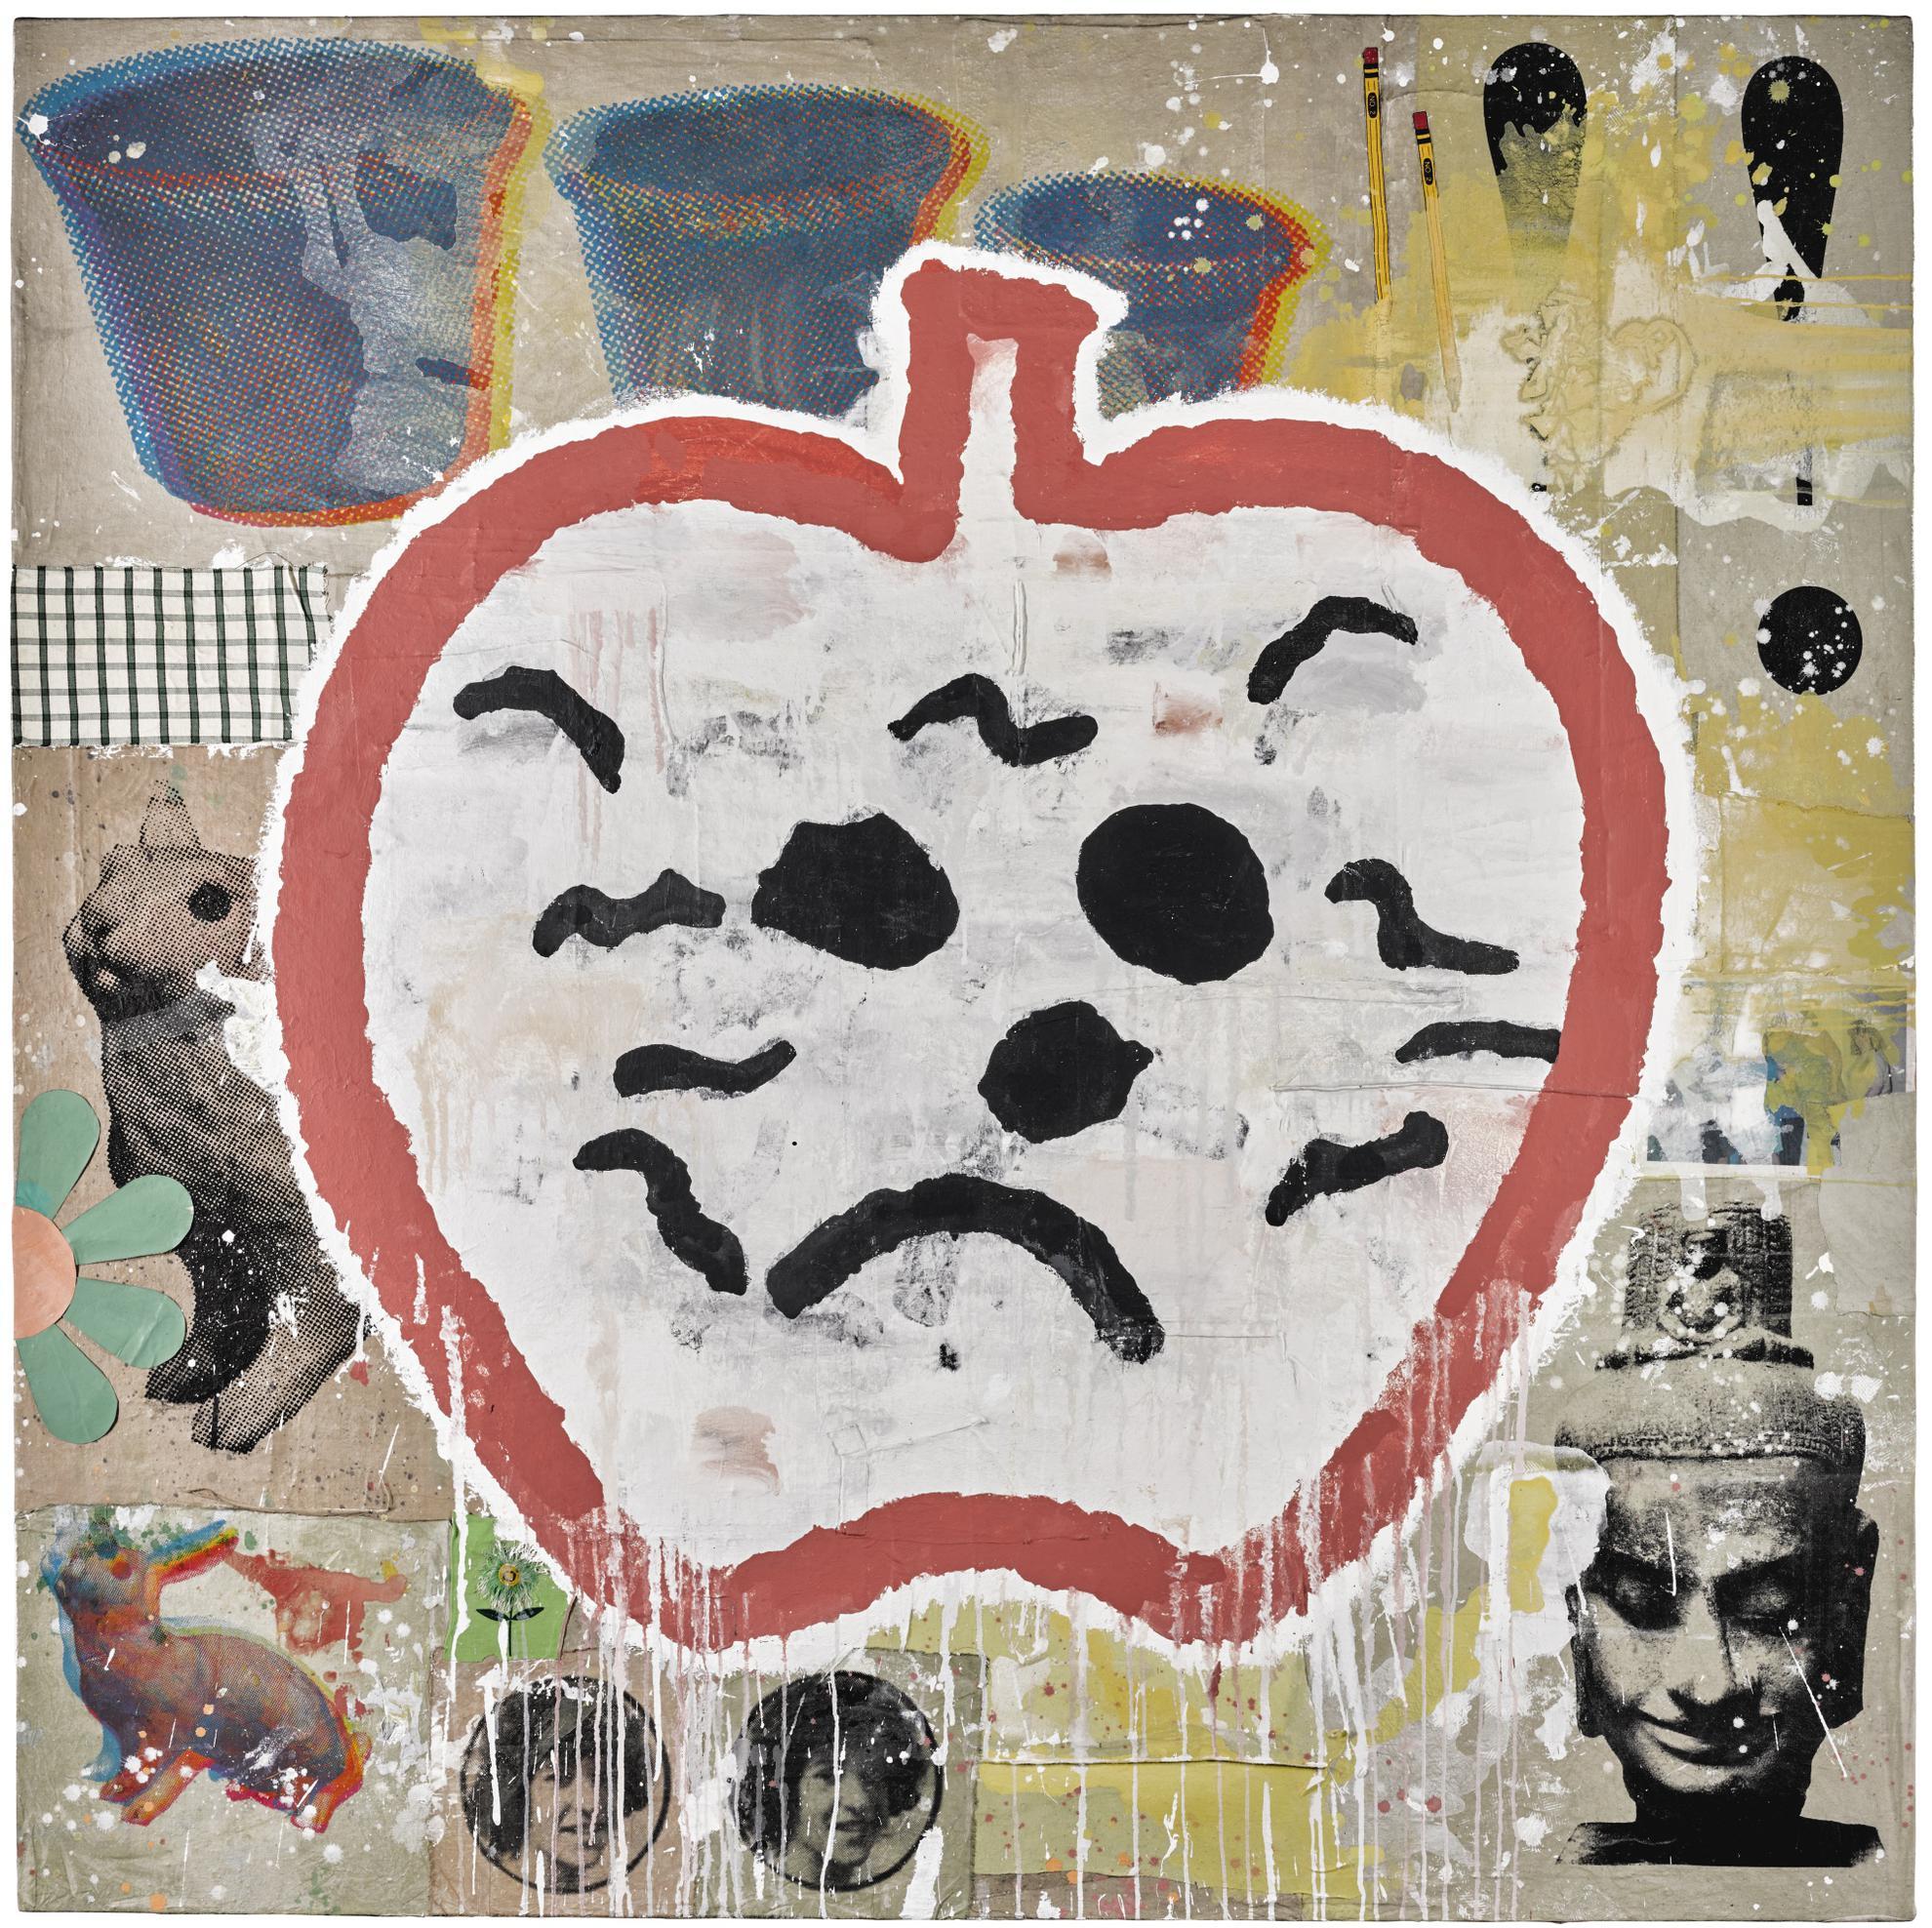 Donald Baechler-Discouraged Deeds-2004